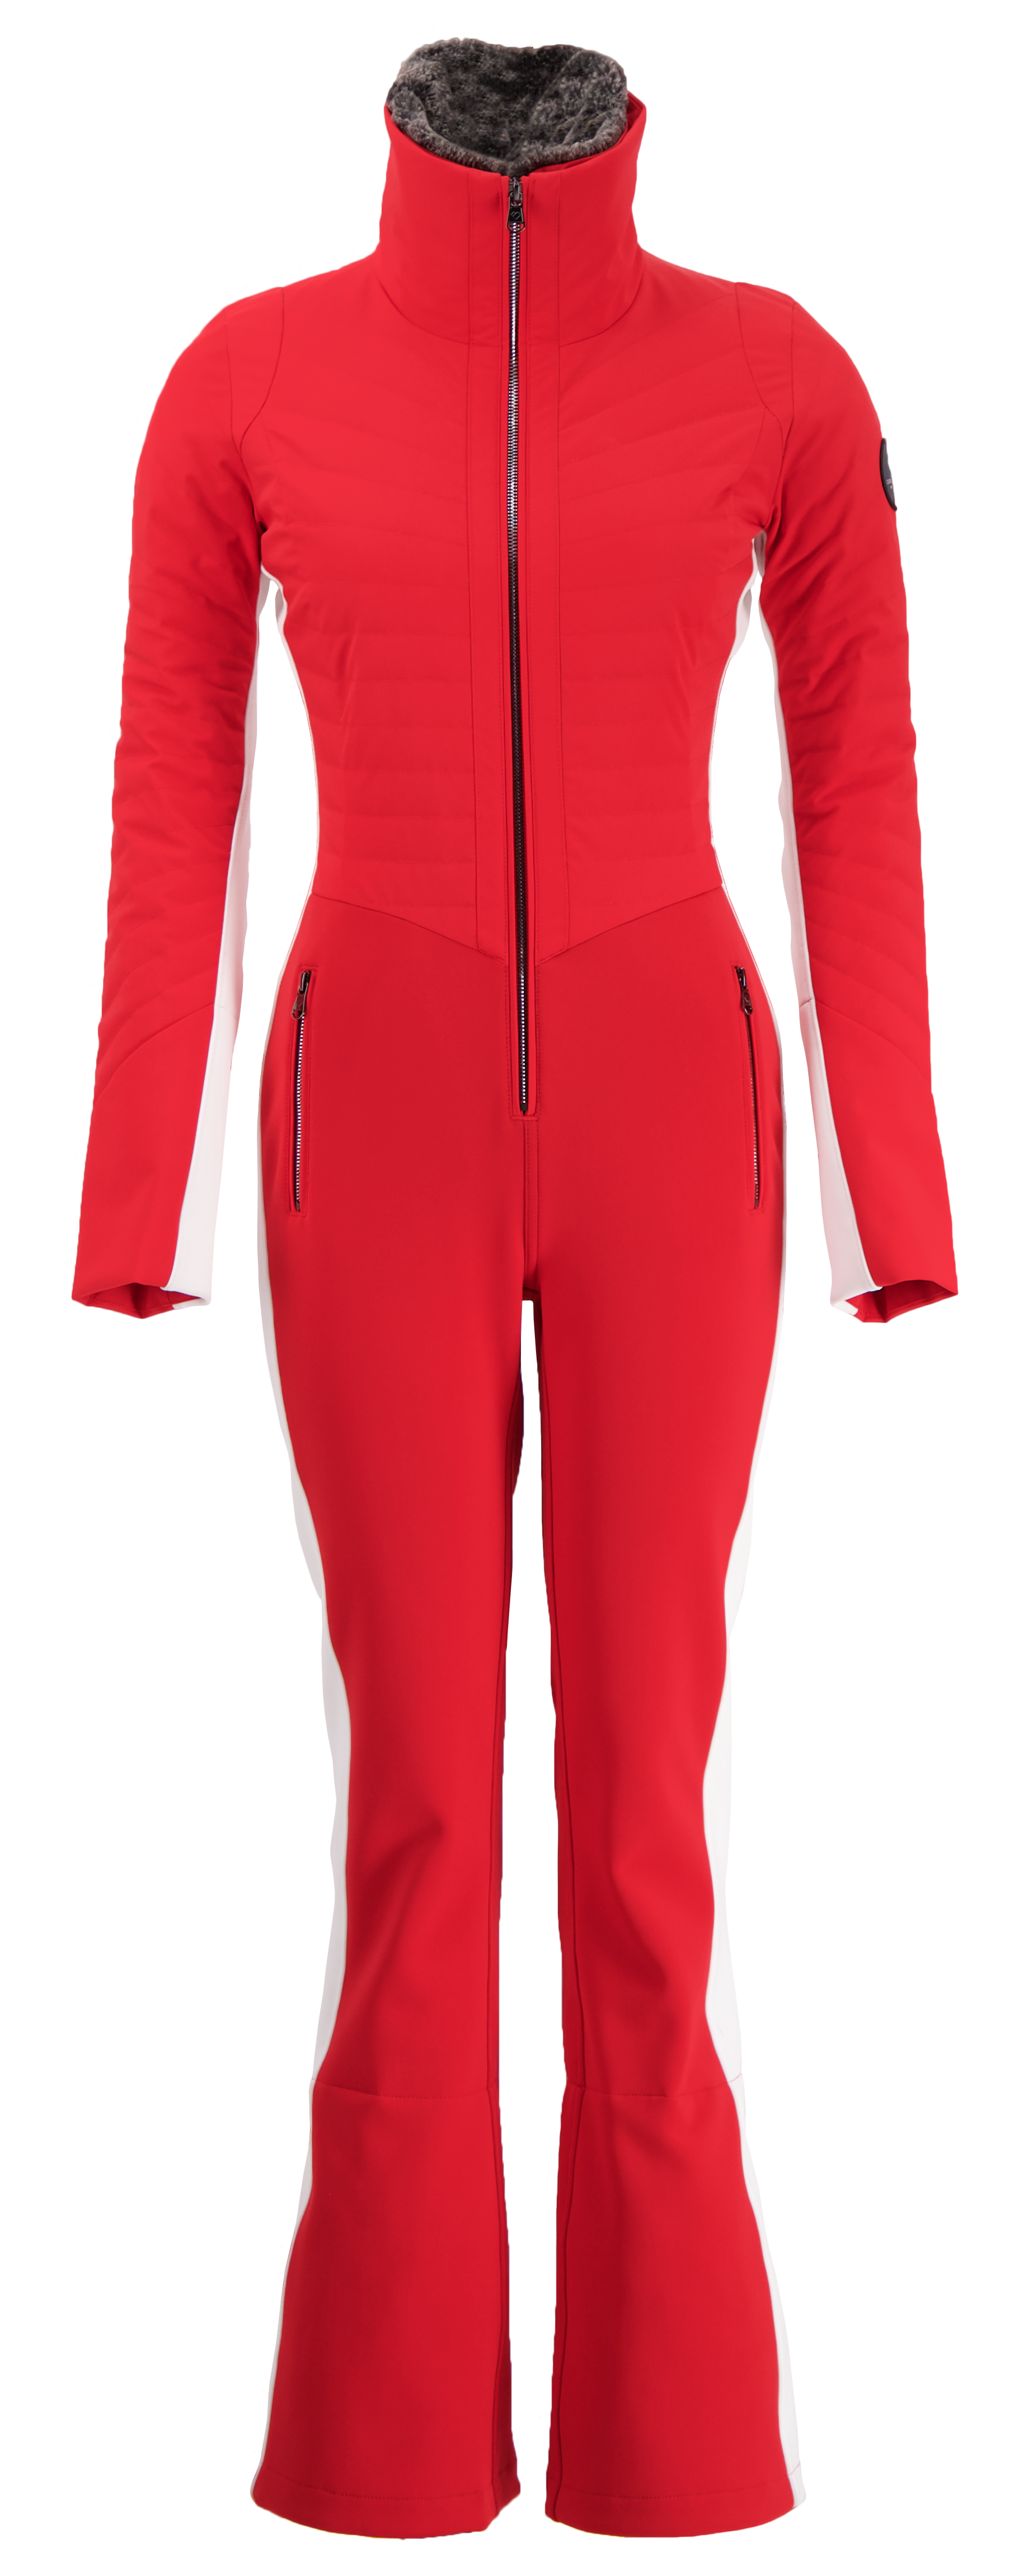 The 2021 Nordica Santa Ana 98 women's all-mountain ski thumb